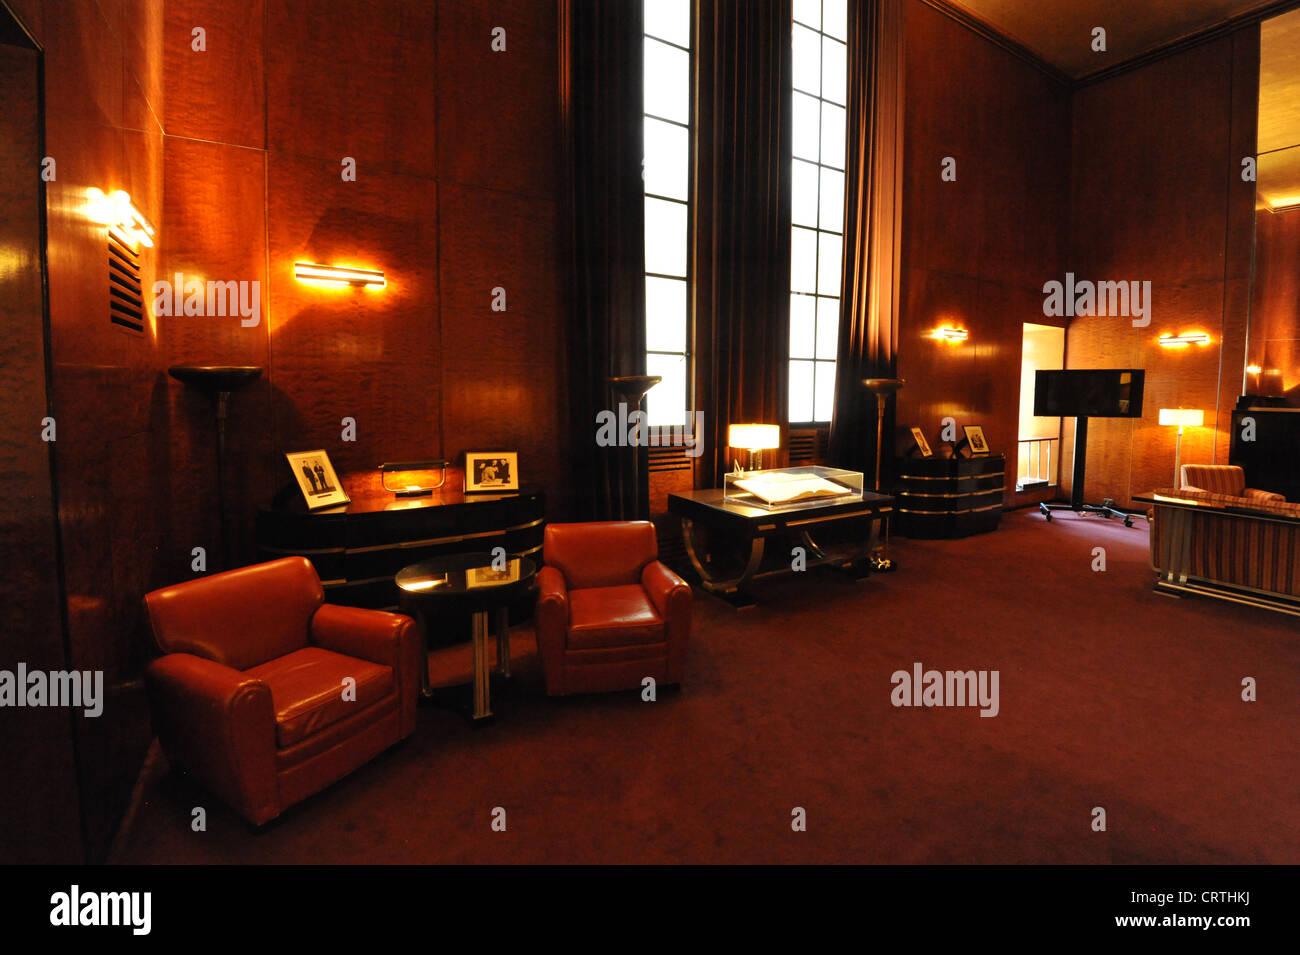 Radio City Music Hall, New York. - Stock Image